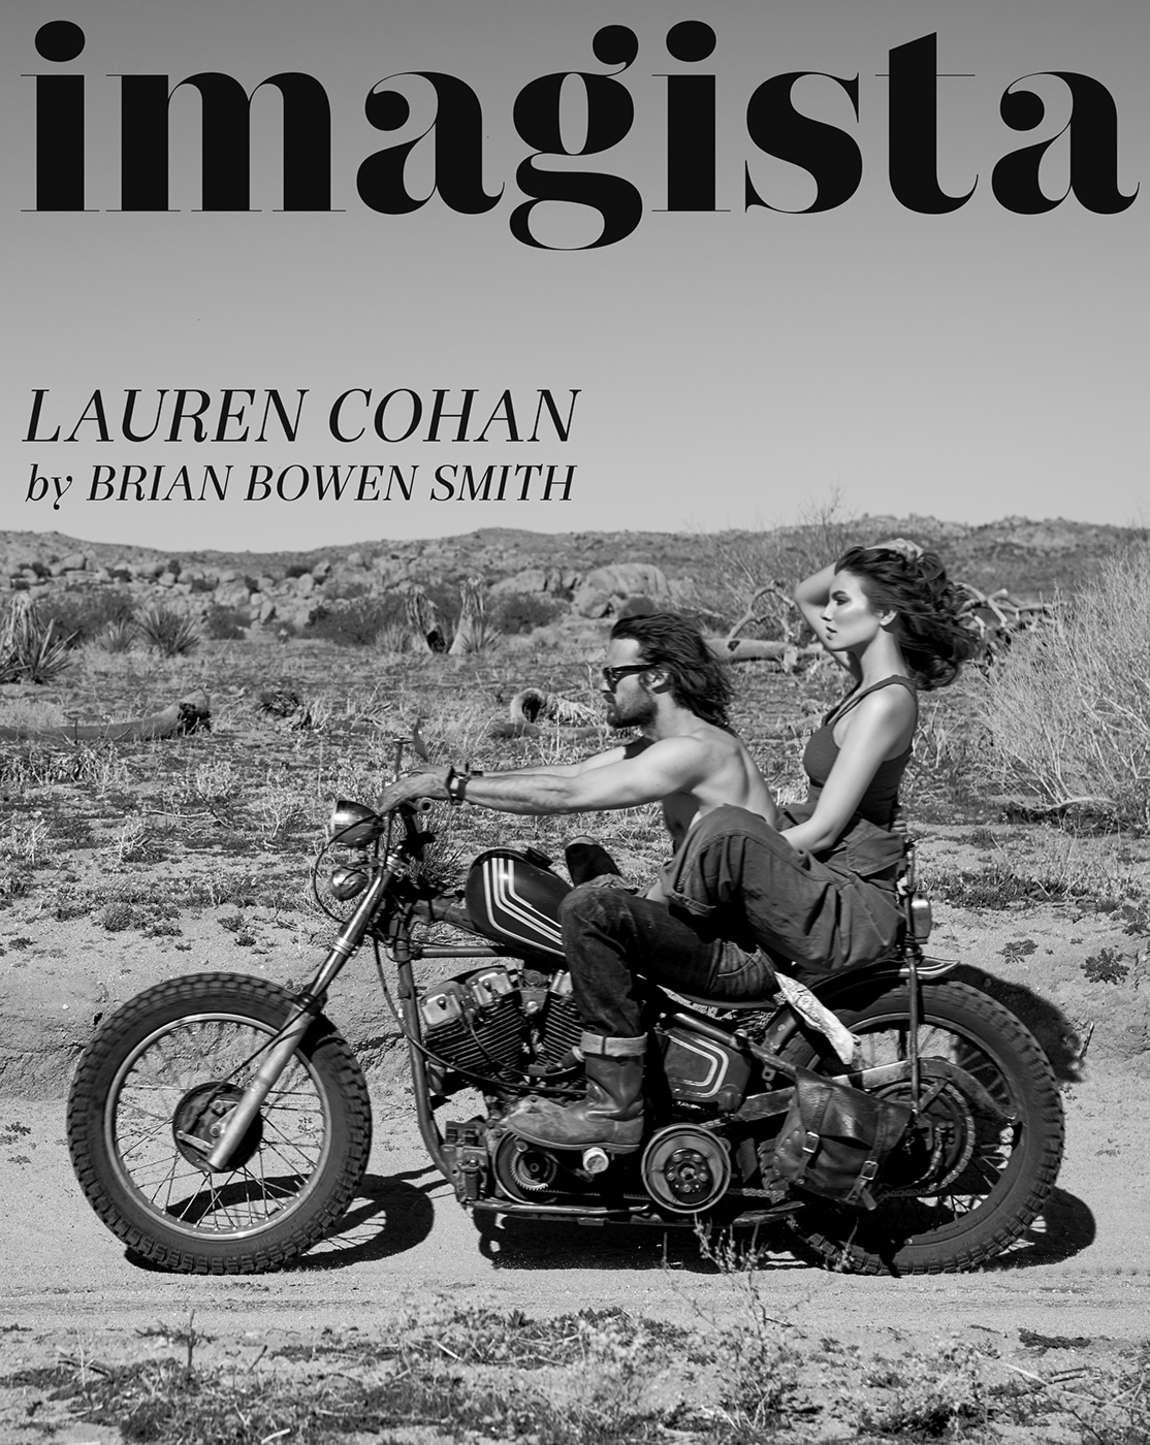 Lauren Cohan - Imagista Magazine 2015